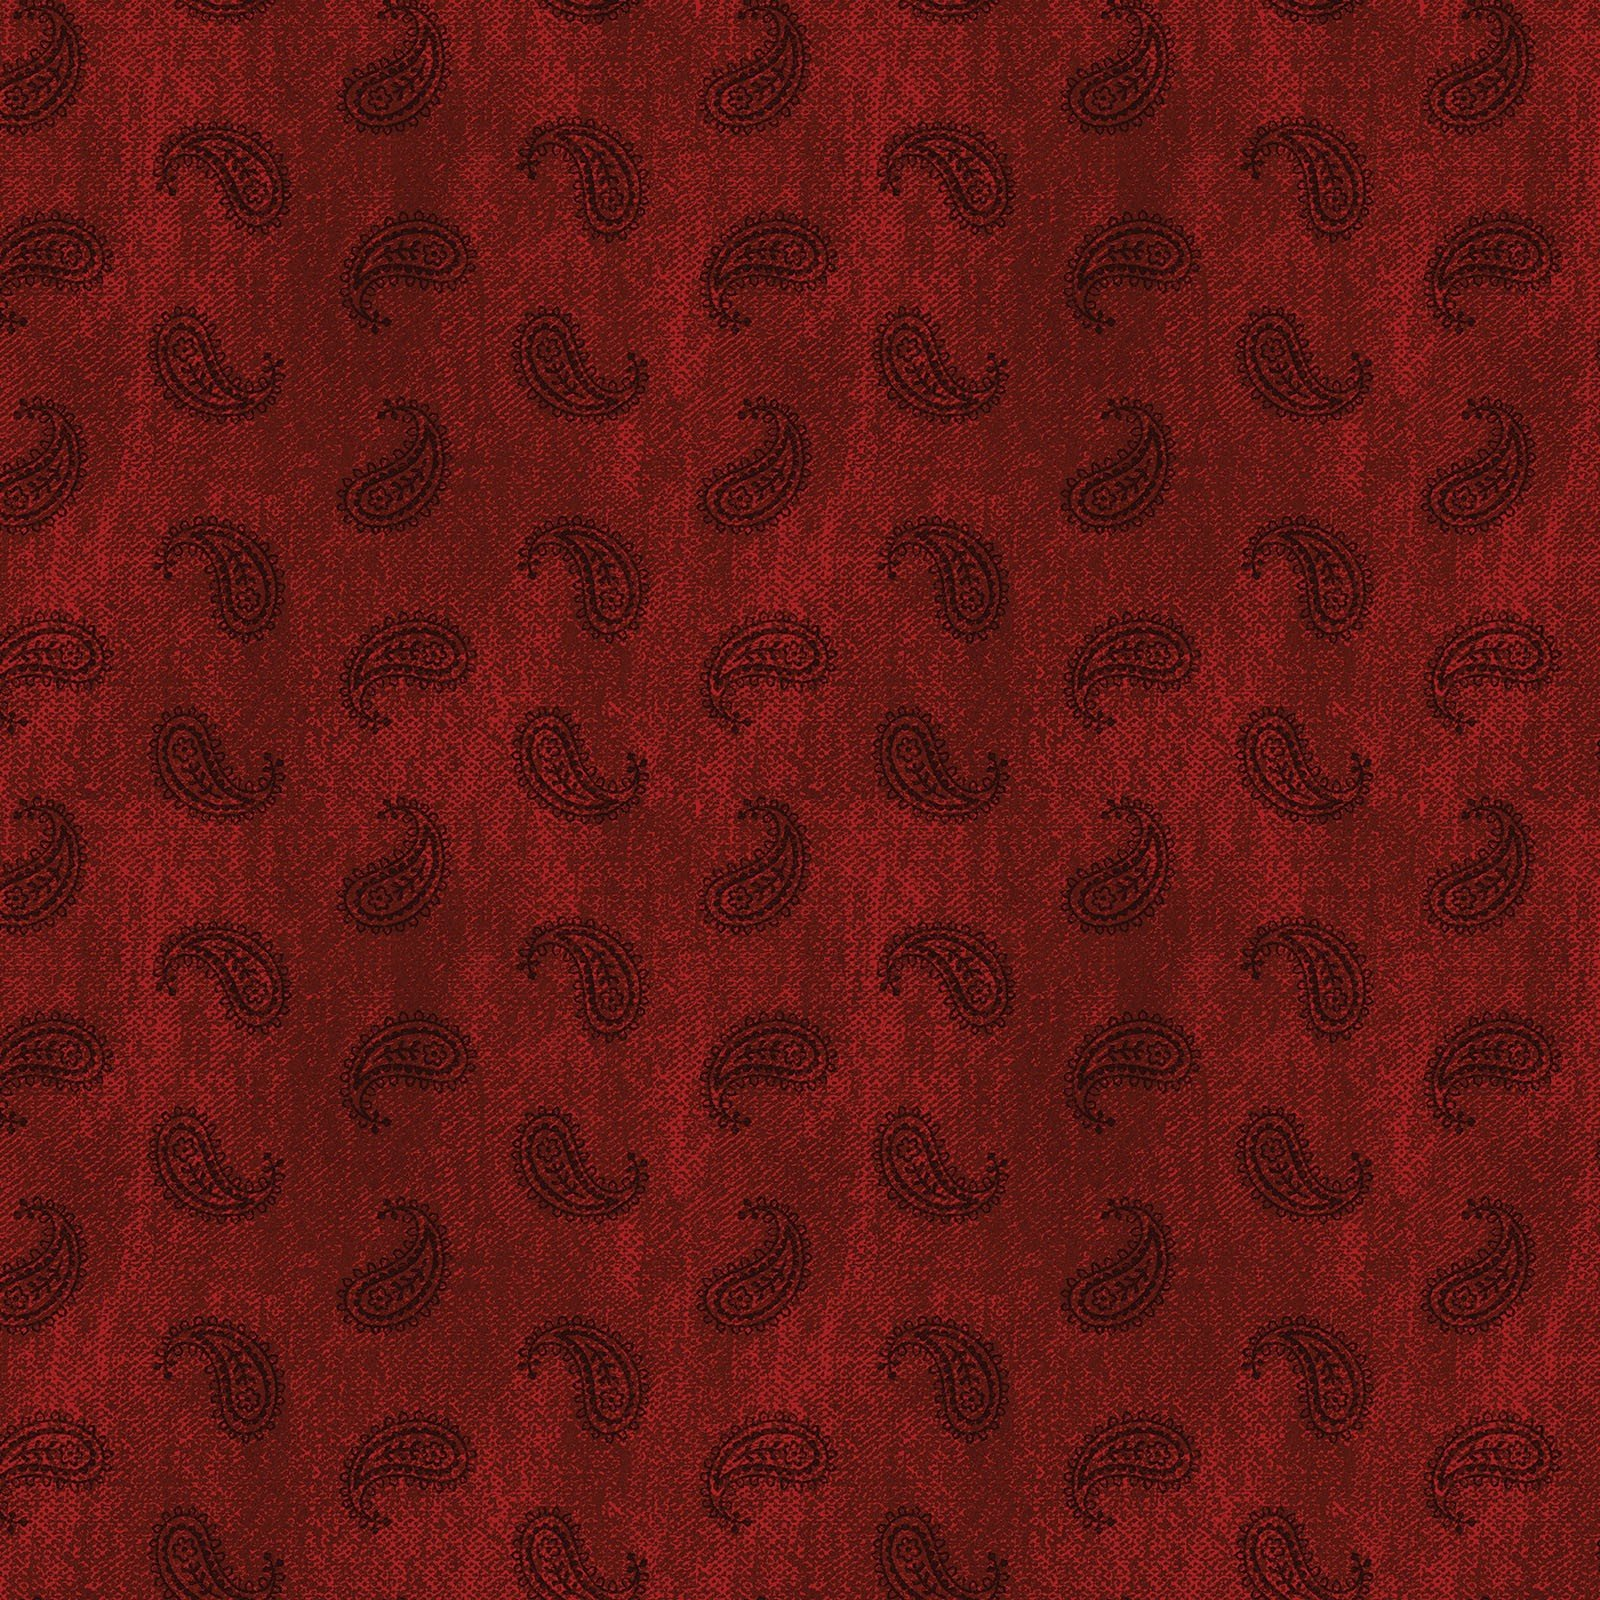 Red Paisley - American Rustic - BEN6339-10